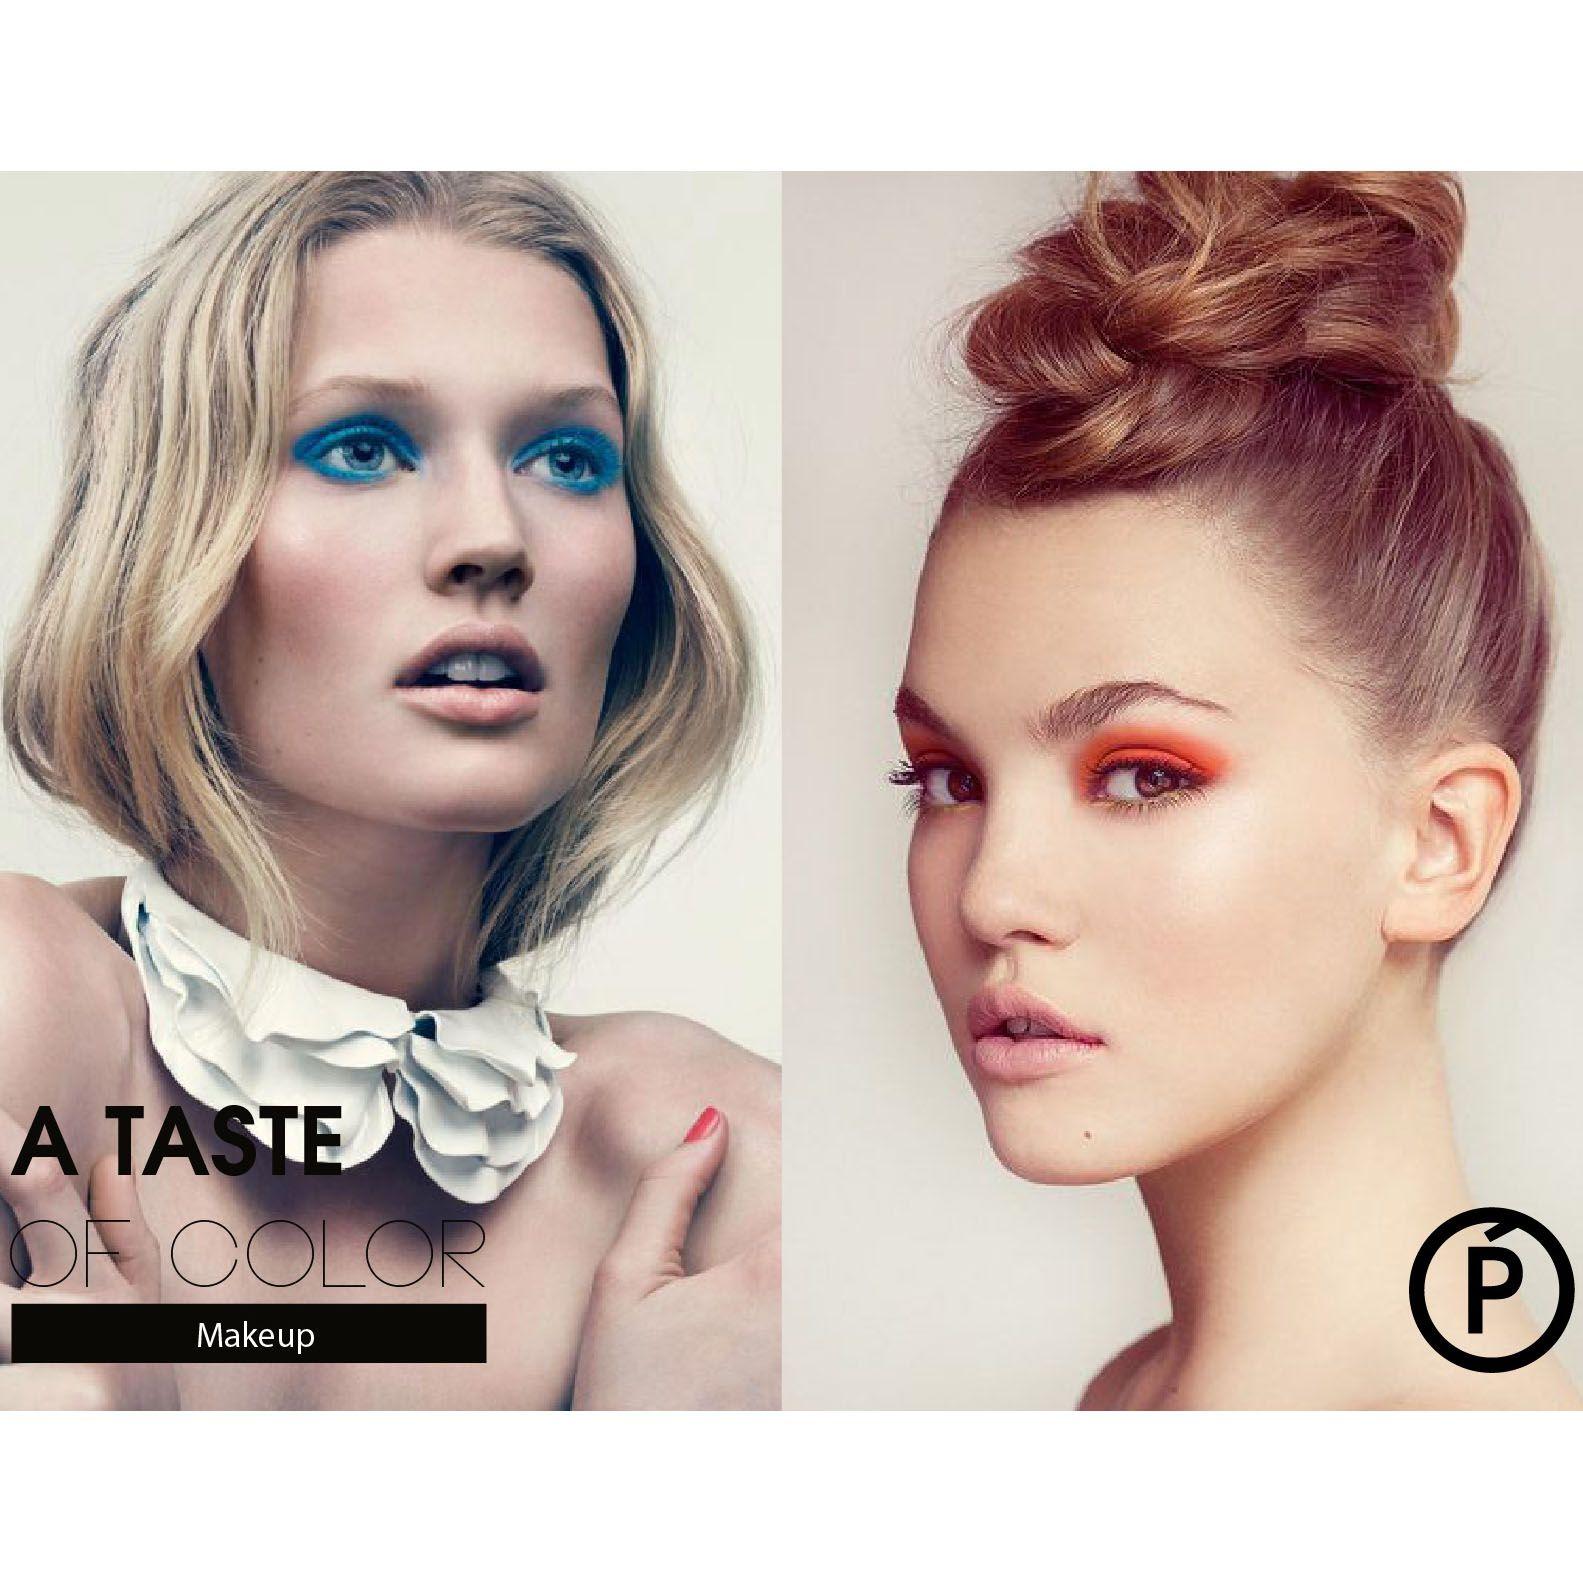 Shop Milk Makeup's Eye Pigment at Sephora. This eyeshadow